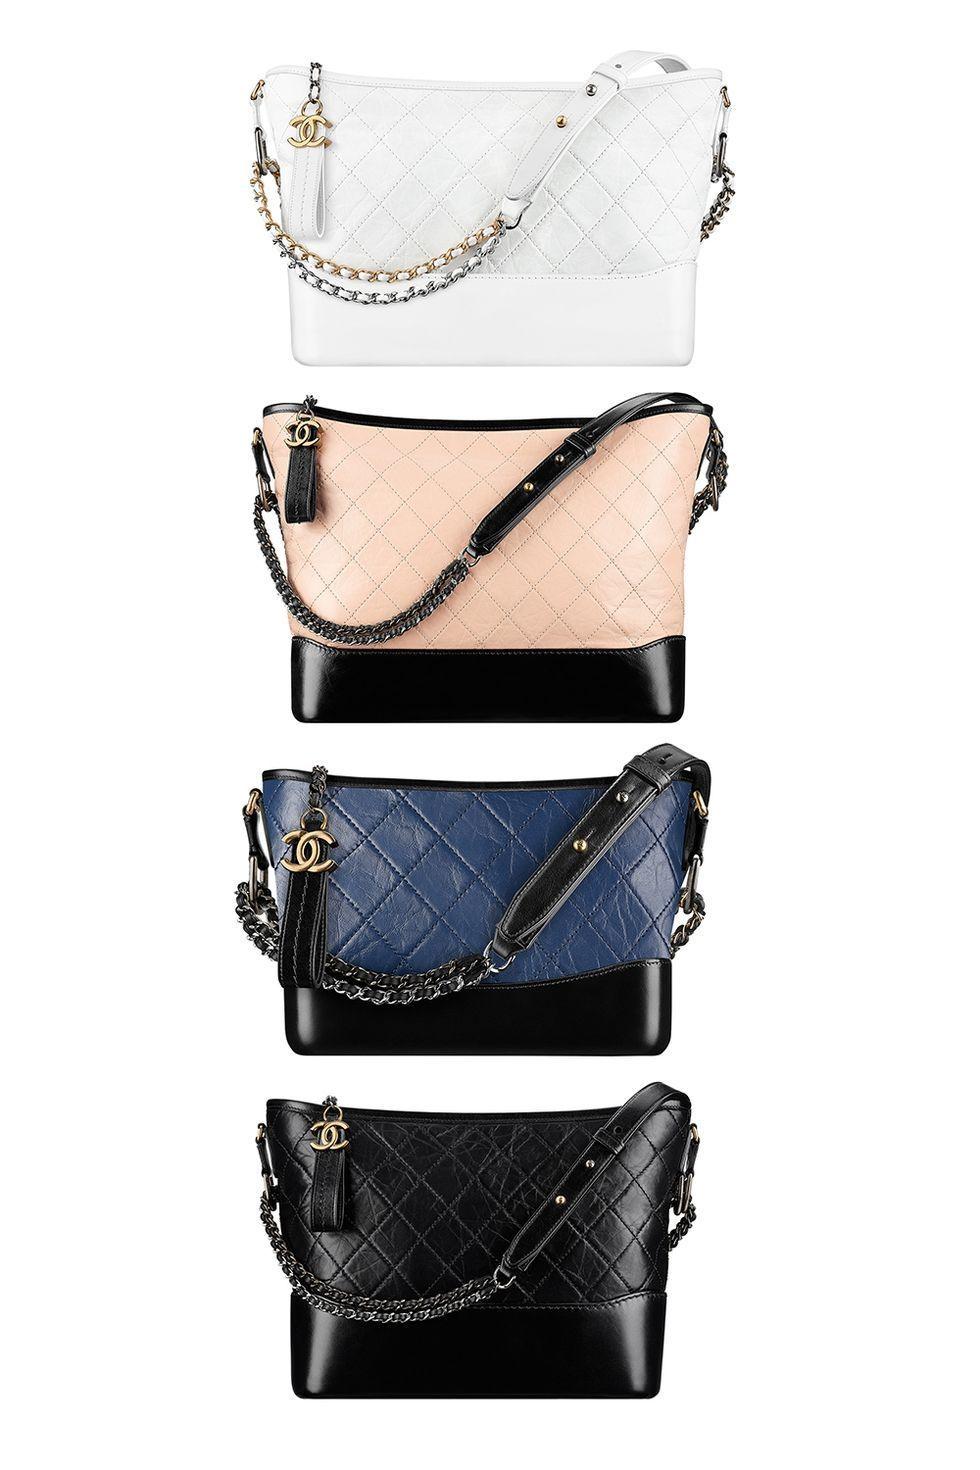 New Chanel 2017 Bag Comps